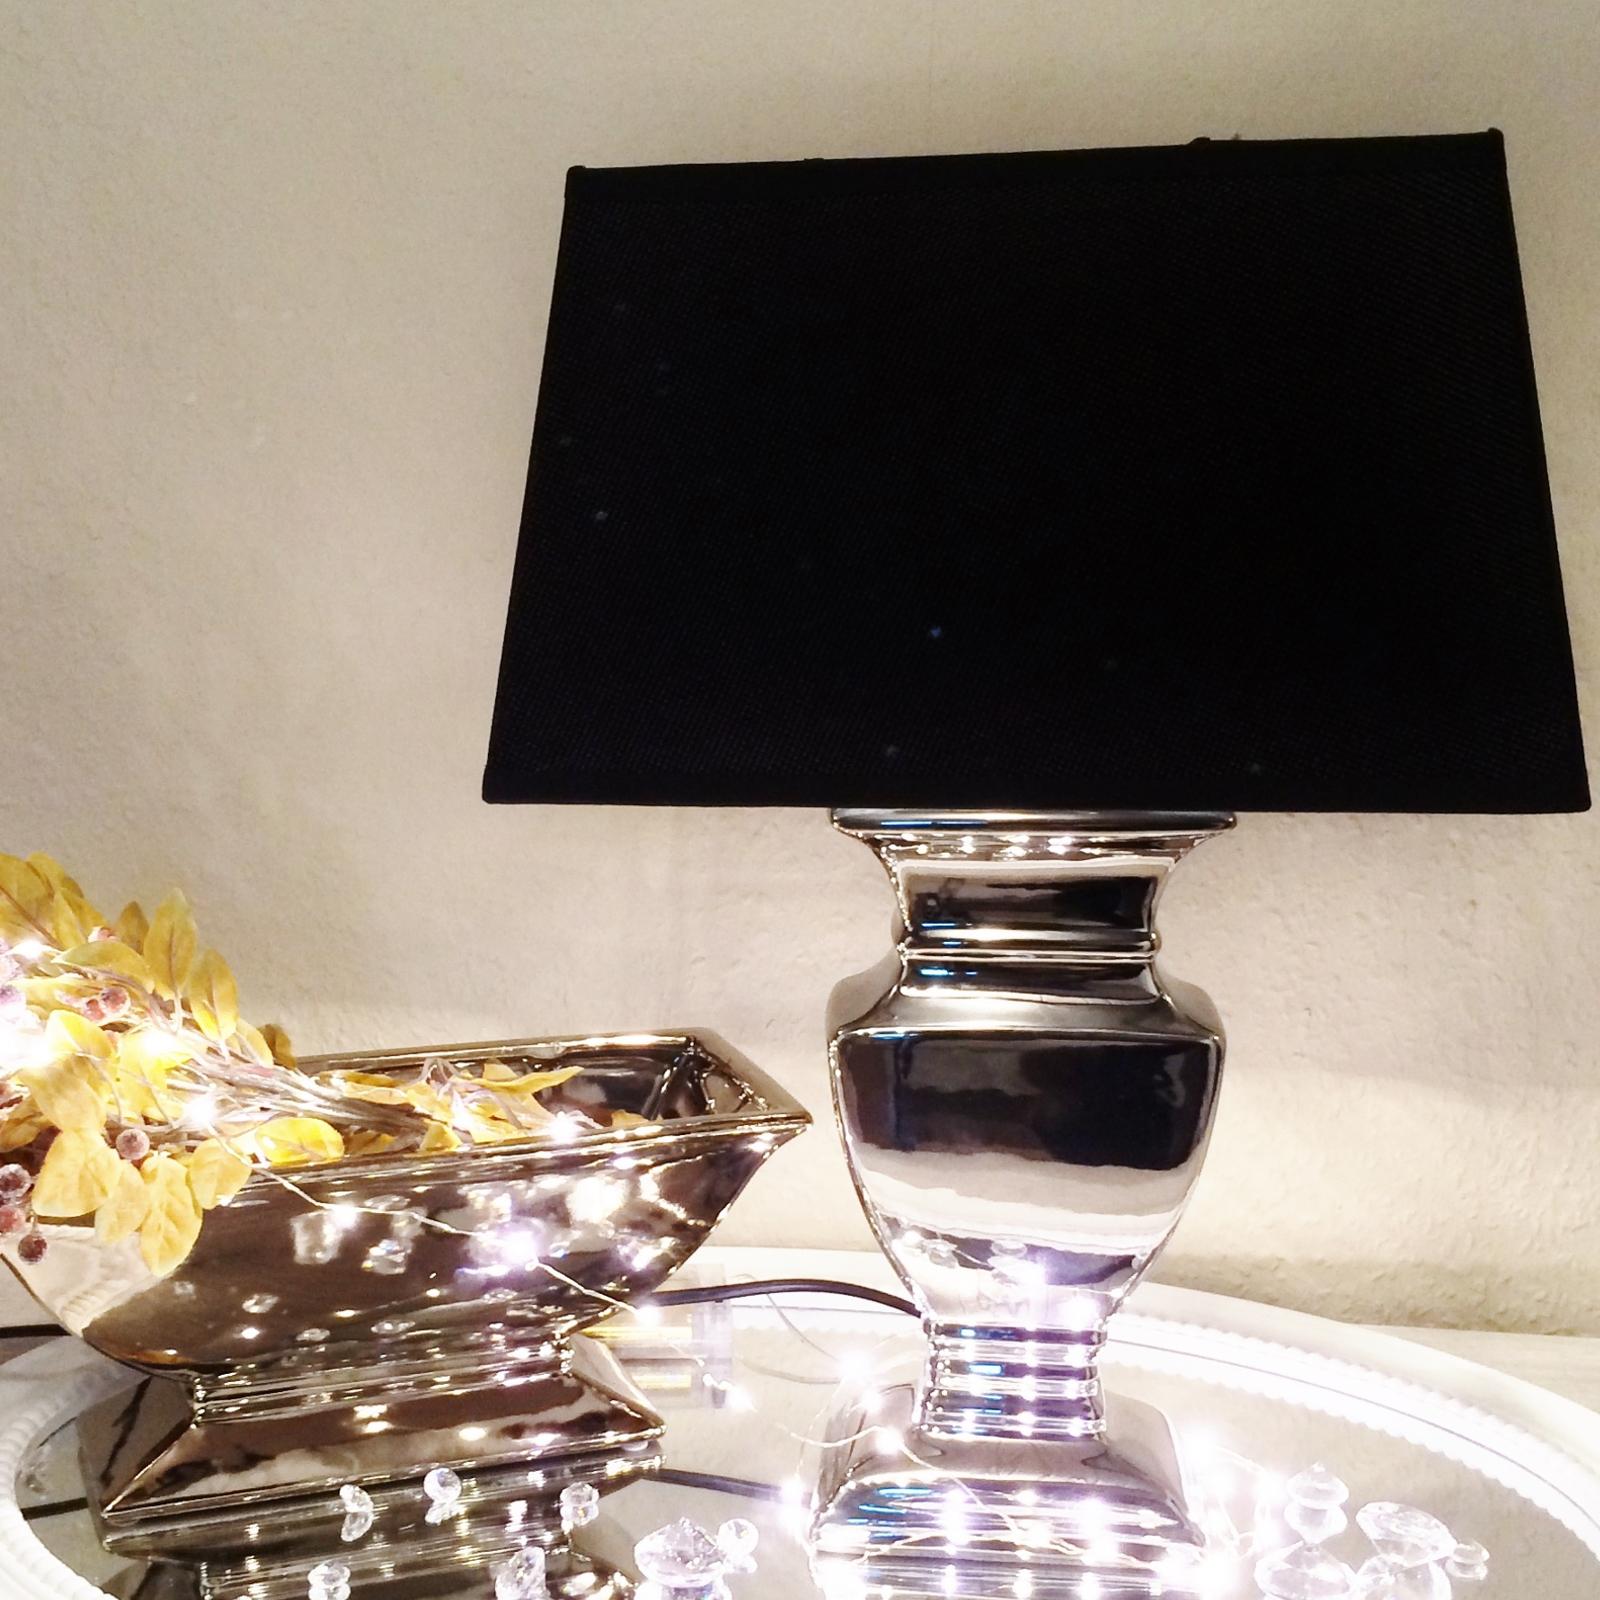 Ceramica lampade base paralume da tavolo comodino luce ebay - Lampade da tavolo in ceramica ...